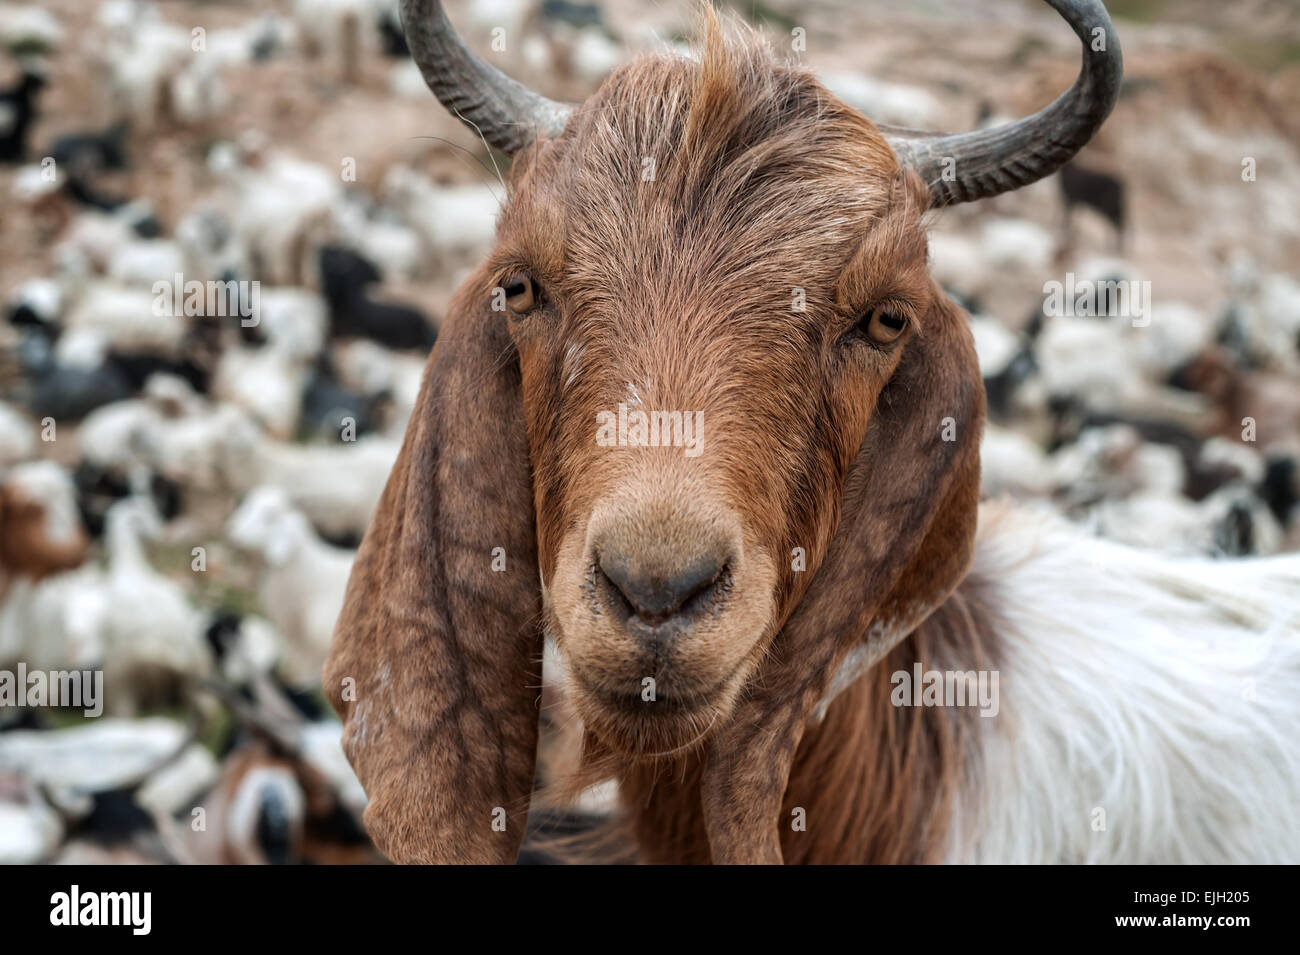 bearded goat portrait close up - Stock Image